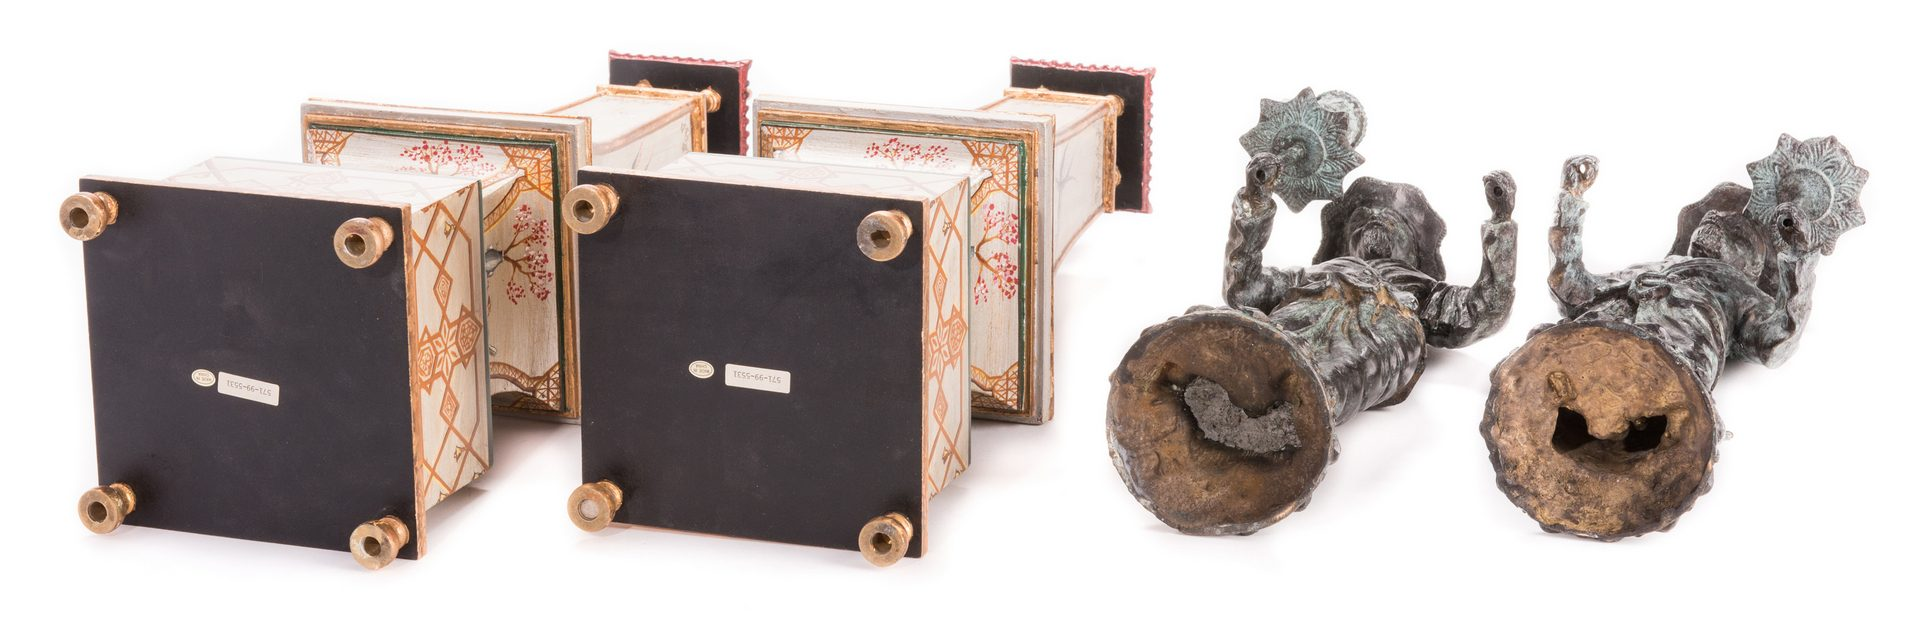 Lot 729: 4 Decorative Chinoiserie Accessories